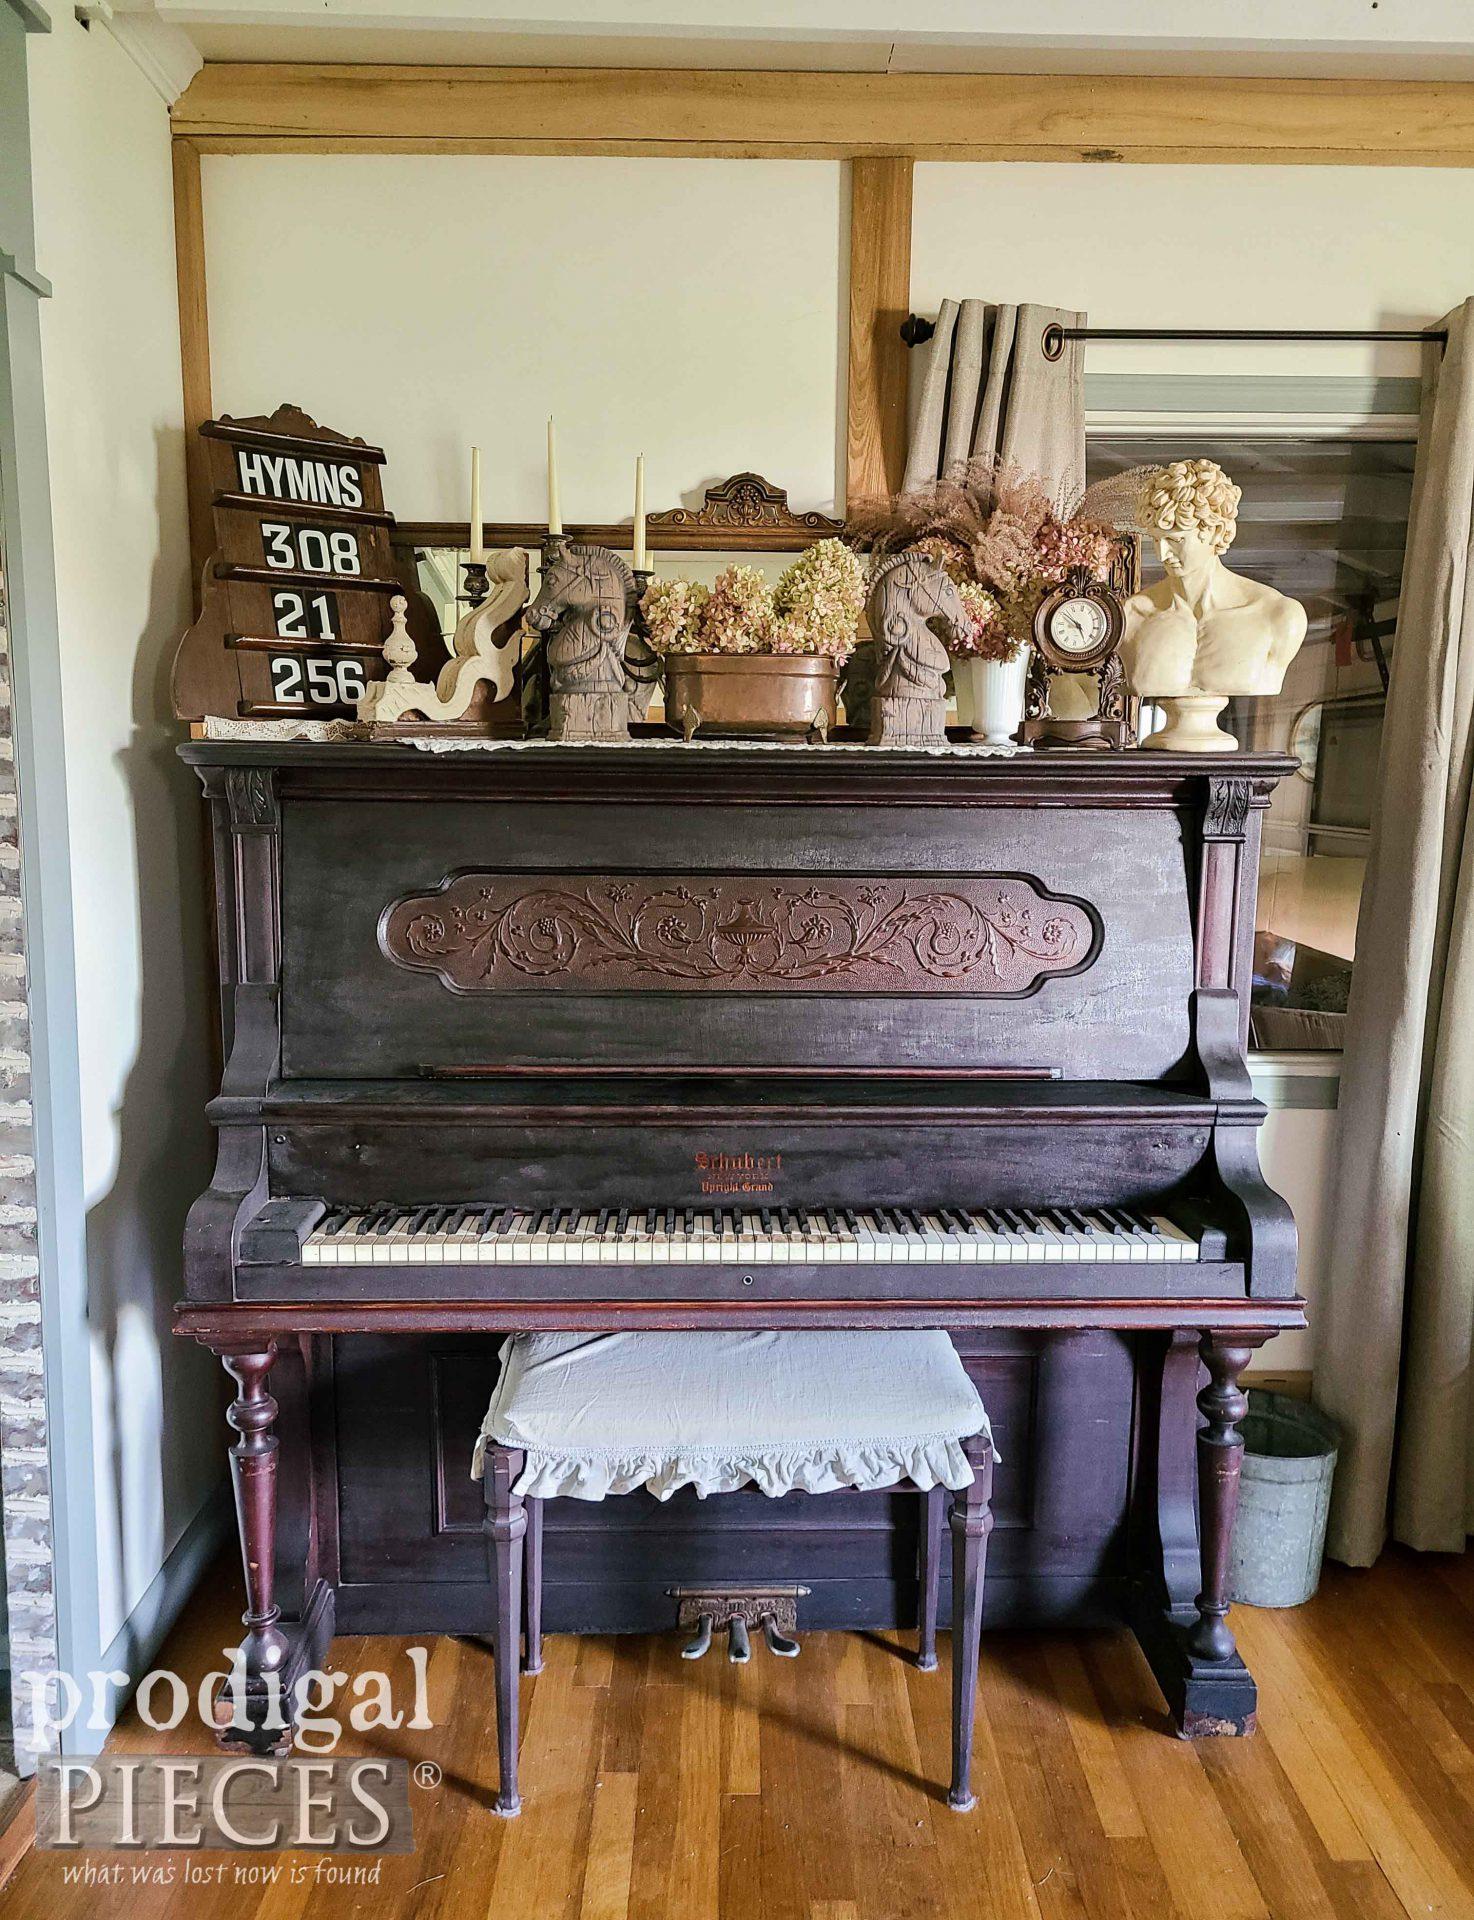 Antique Upright Grand Piano with Vintage Decor by Larissa of Prodigal Pieces | prodigalpieces.com #prodigalpieces #home